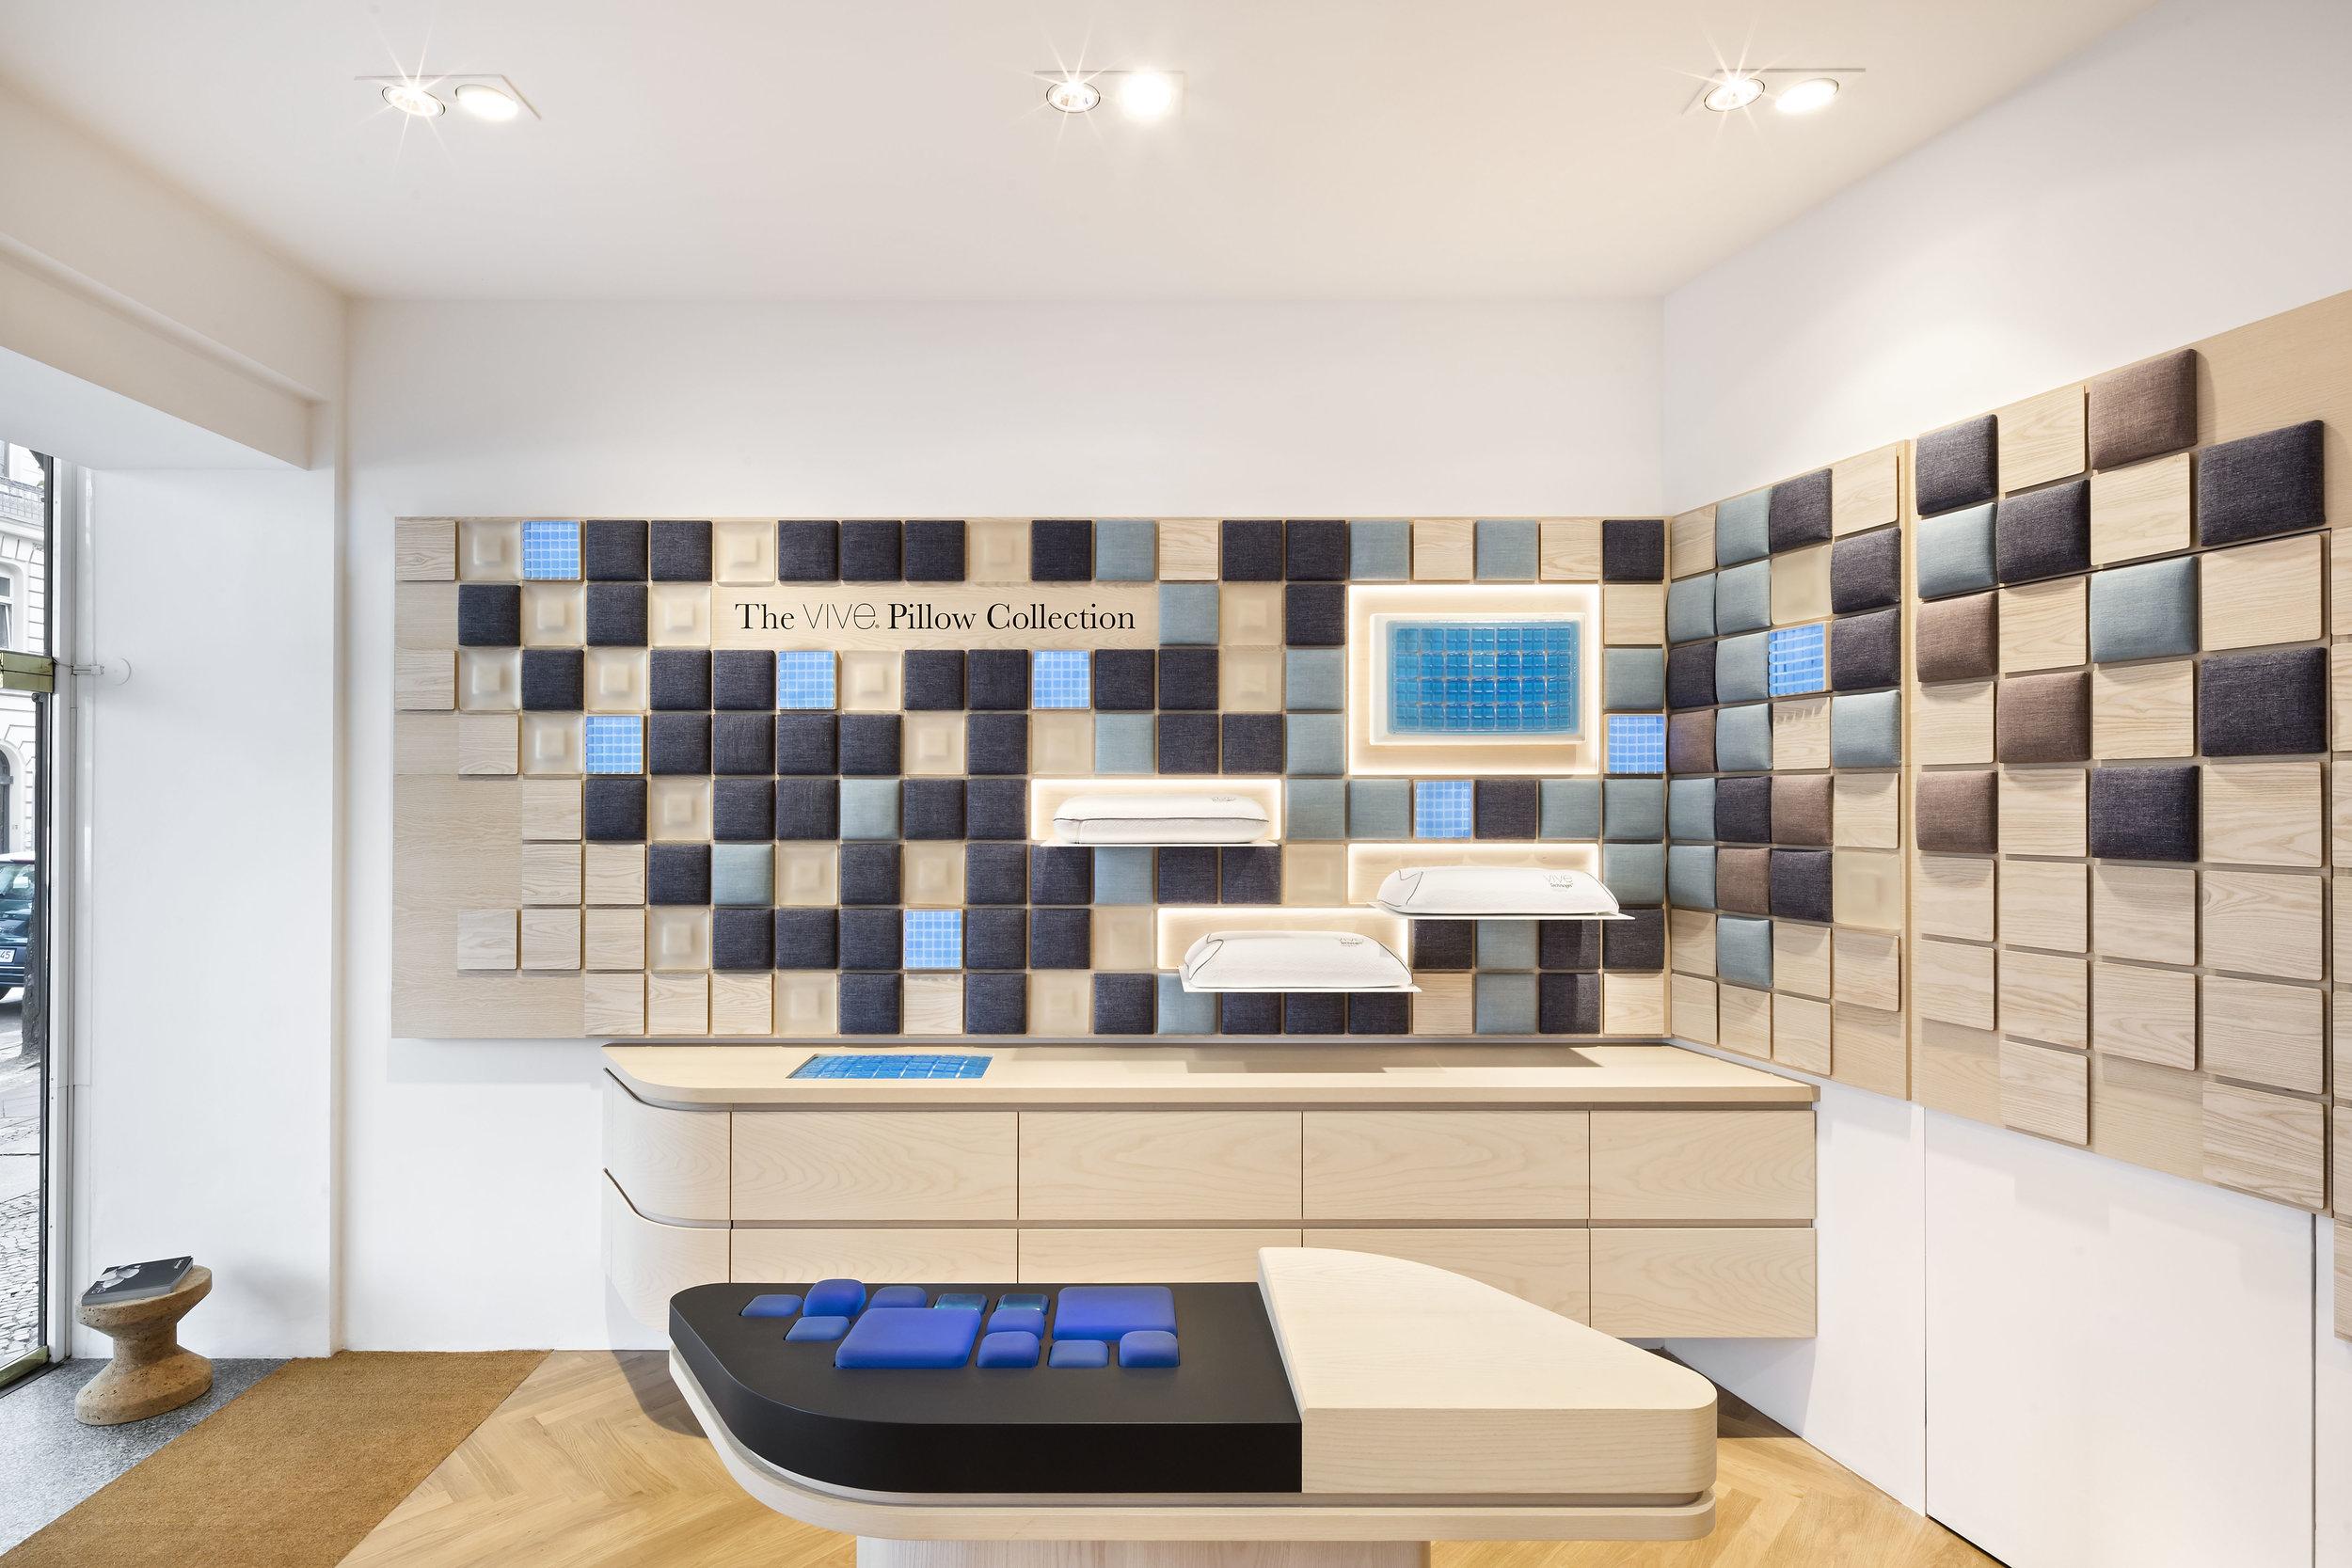 technogel-experience-center_retail-interior-design_coordination-berlin_04.jpg